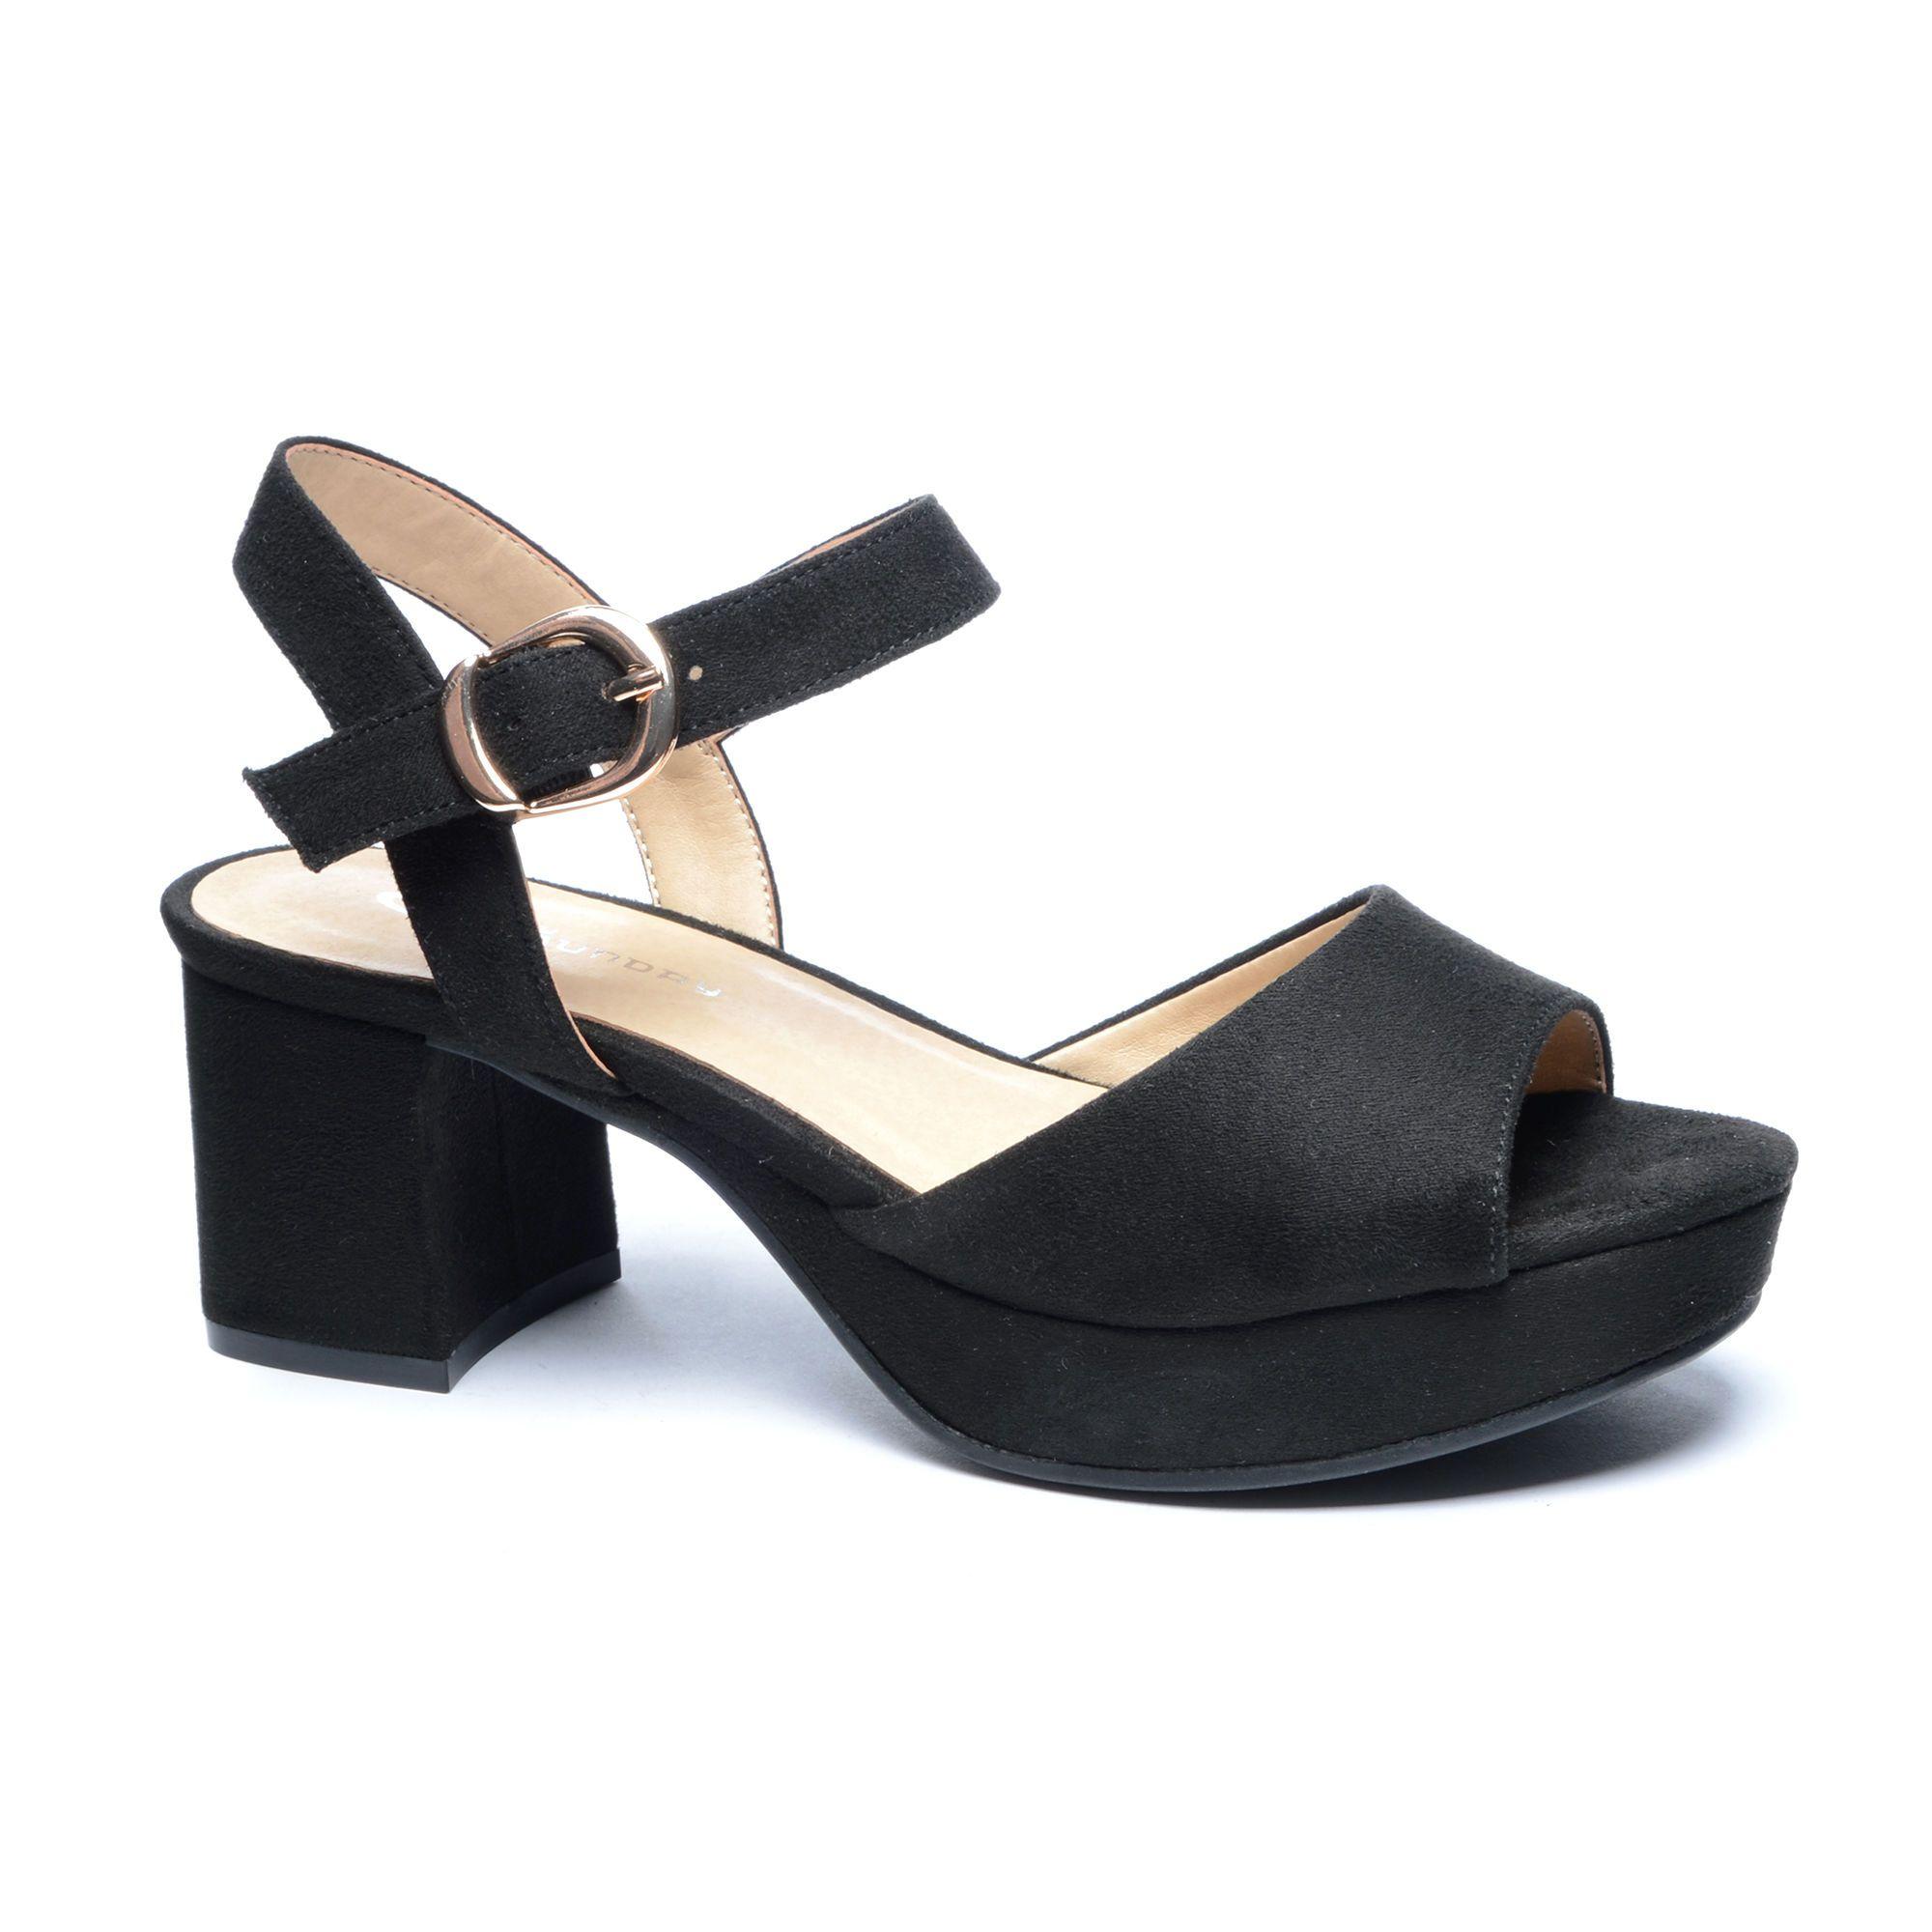 Kensie Peep Toe Platform Sandal Platform Sandals Comfortable